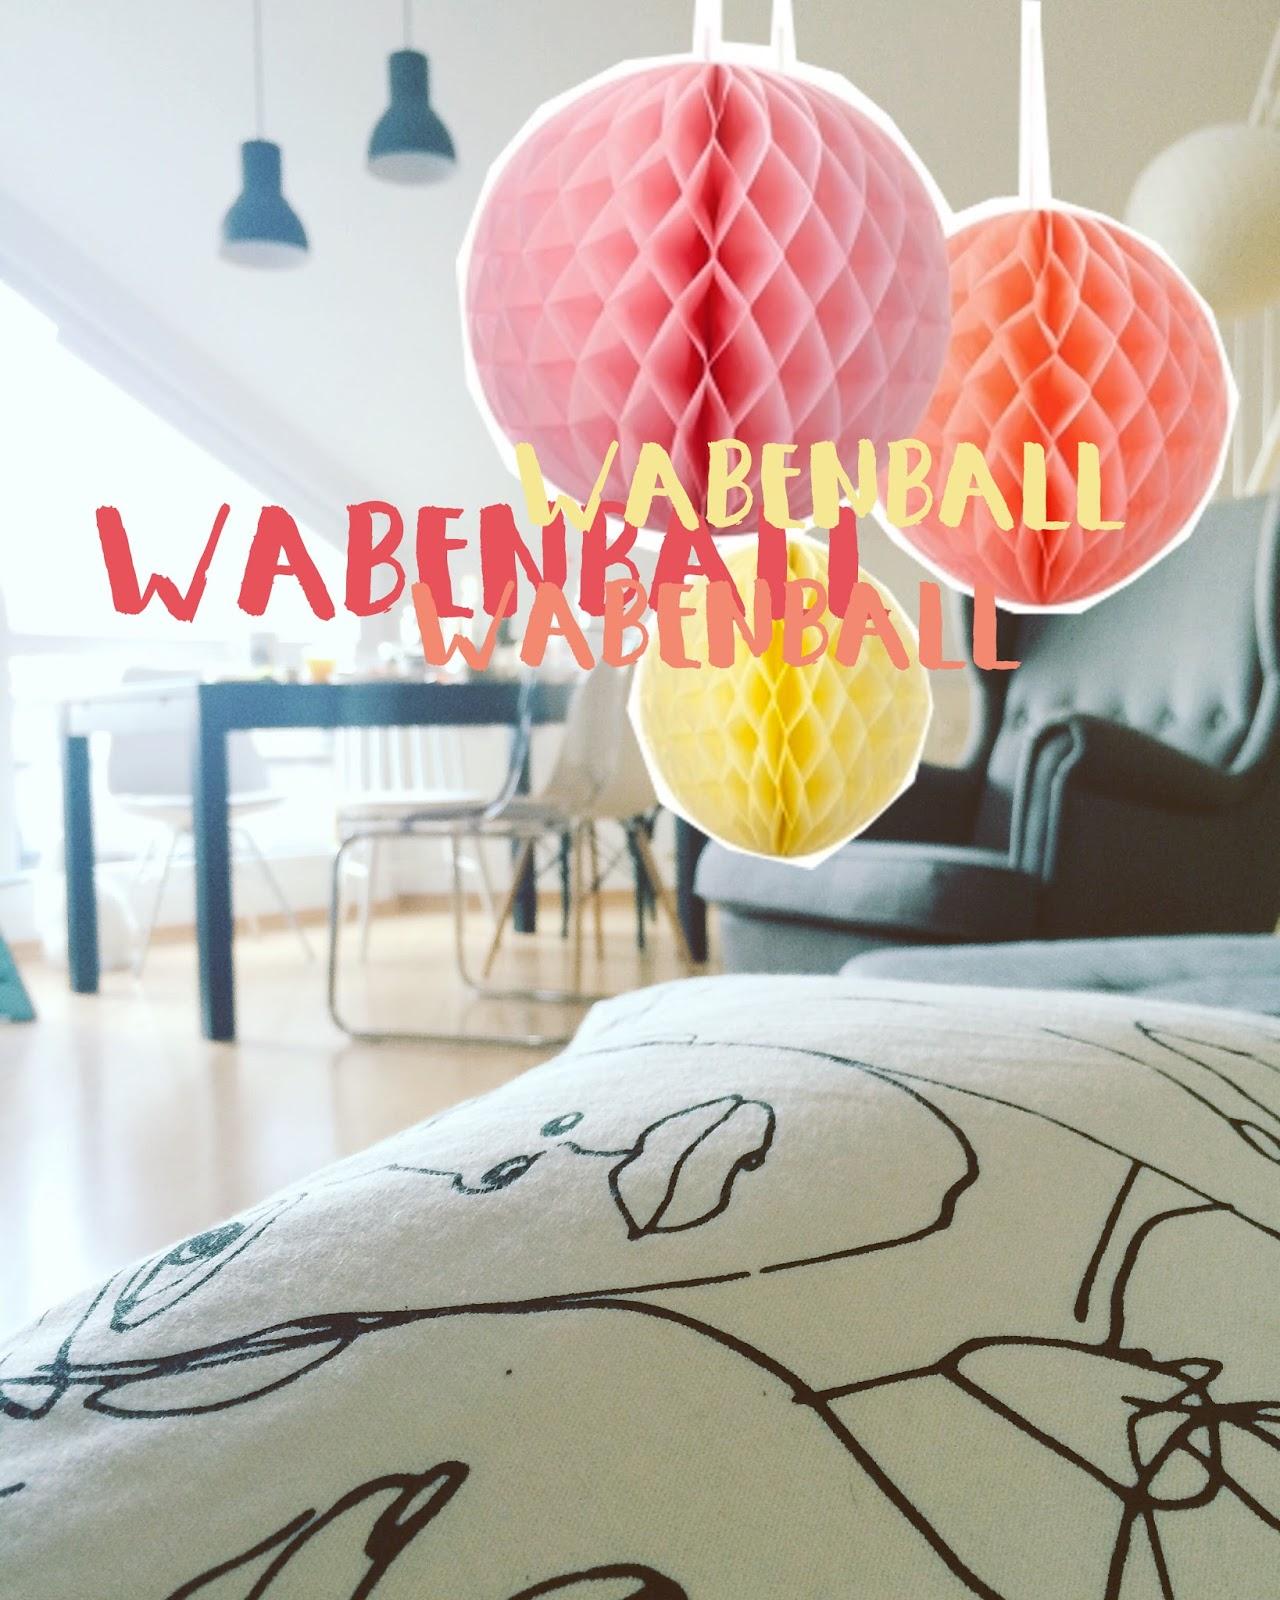 wabenball